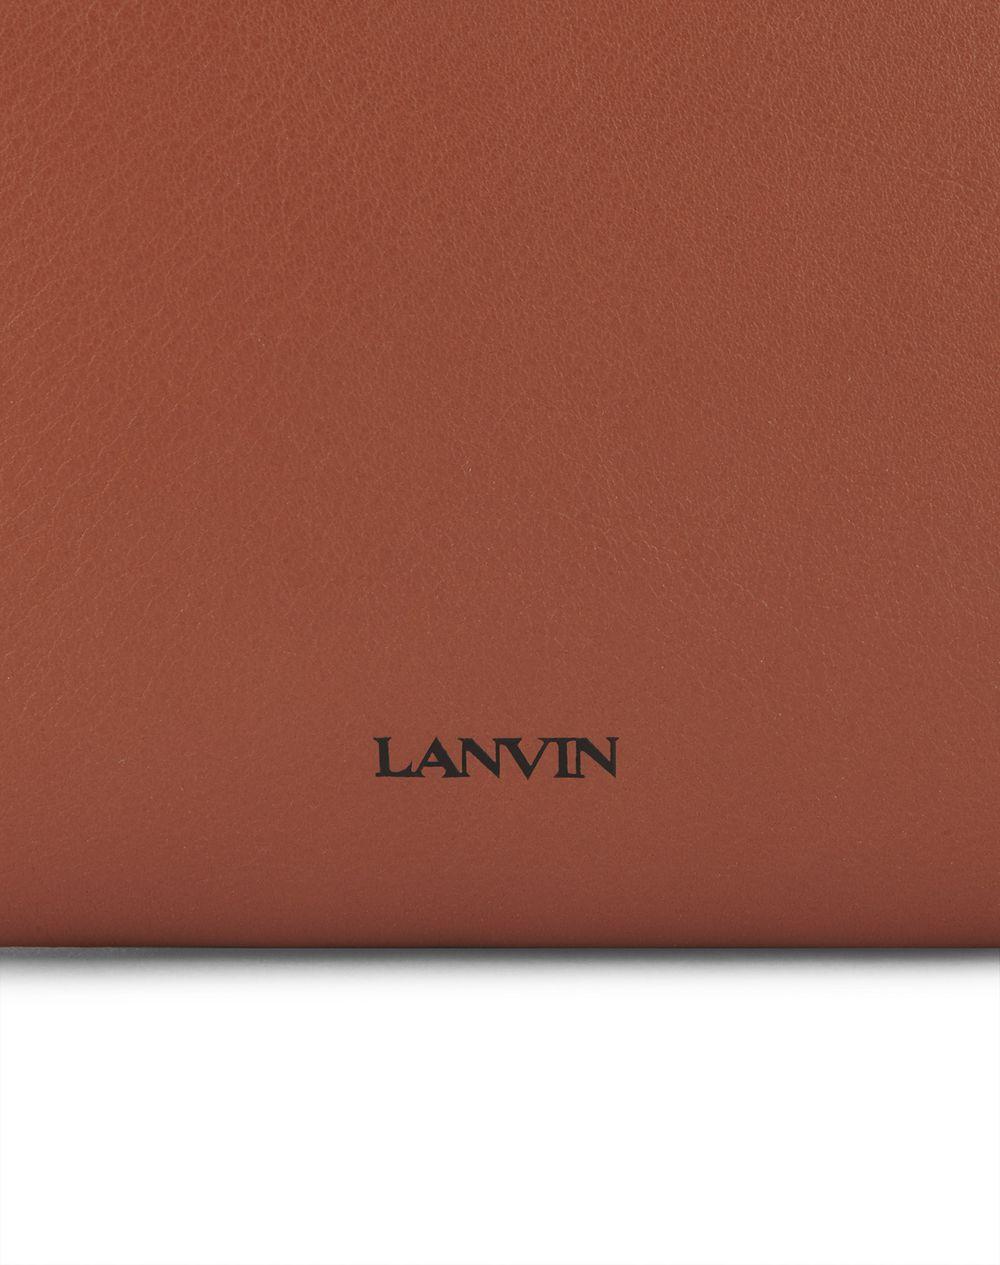 MAGOT CLUTCH - Lanvin